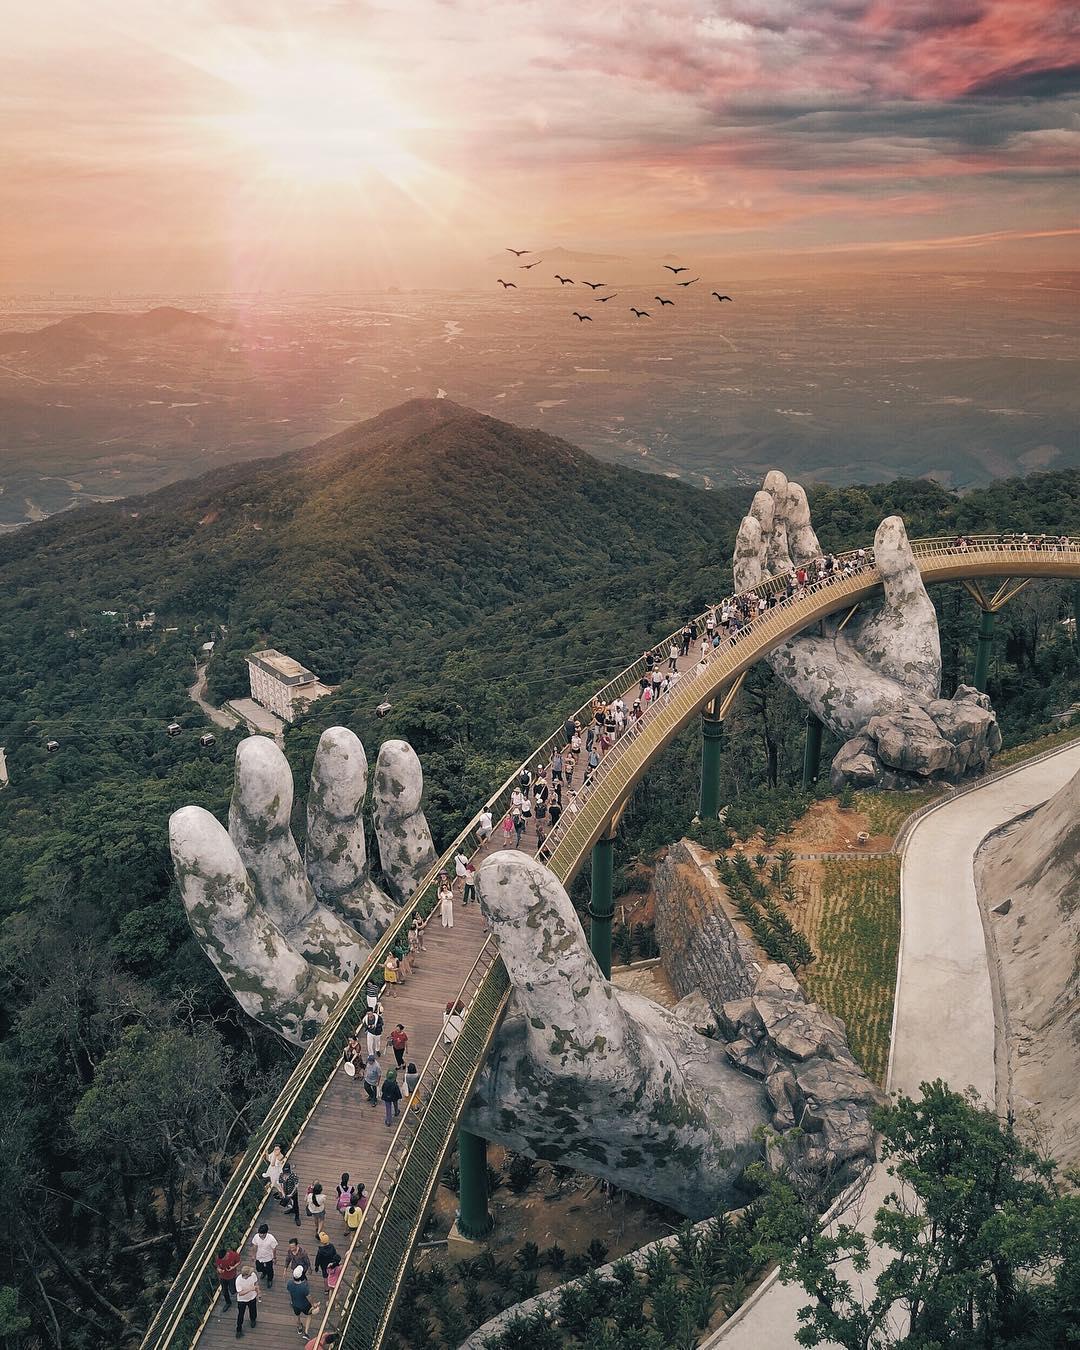 Vietnam's most viral destinations from 2018